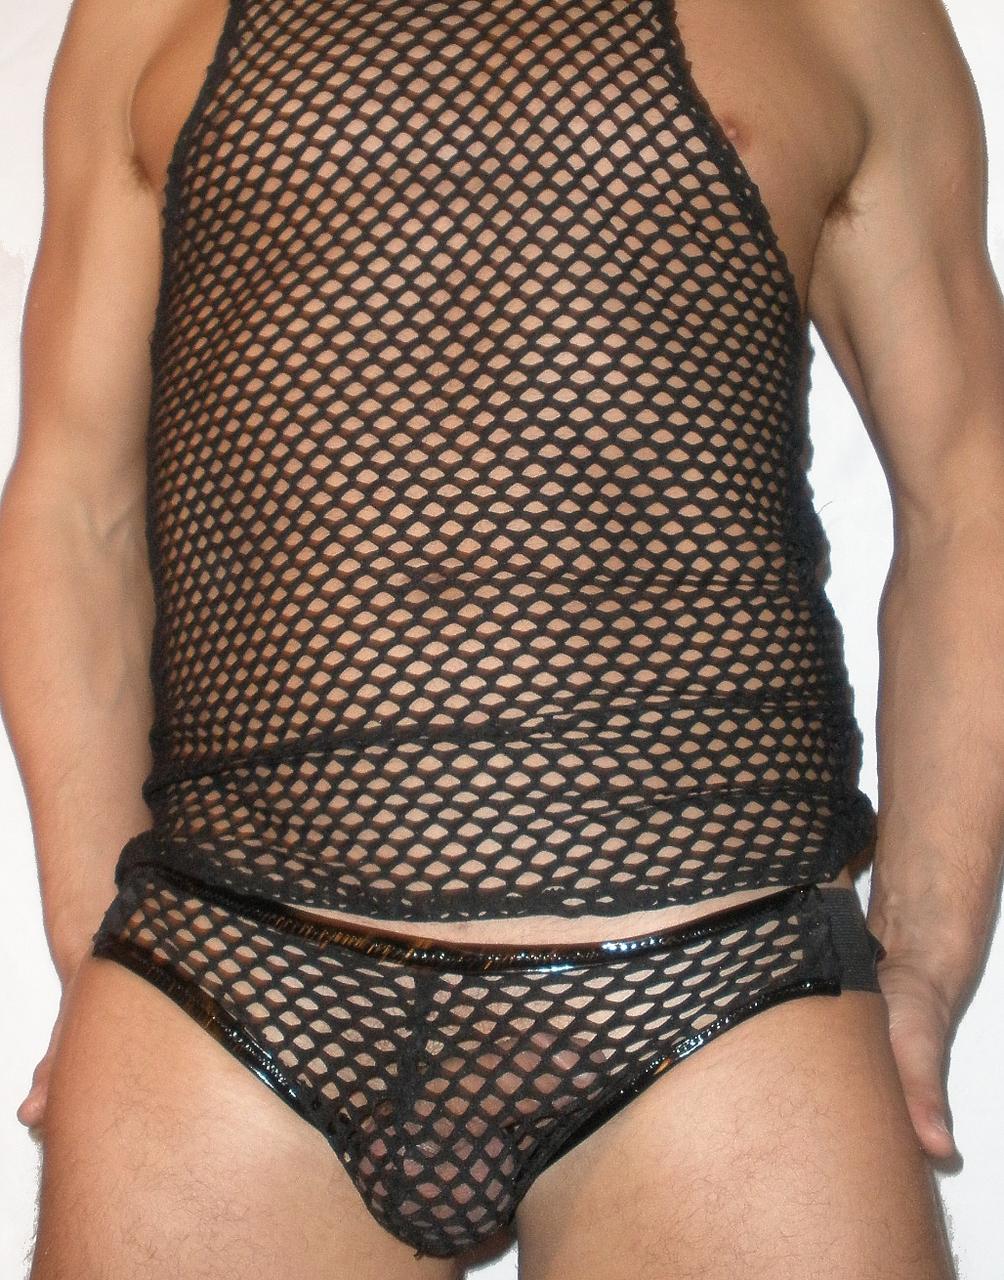 netting jock